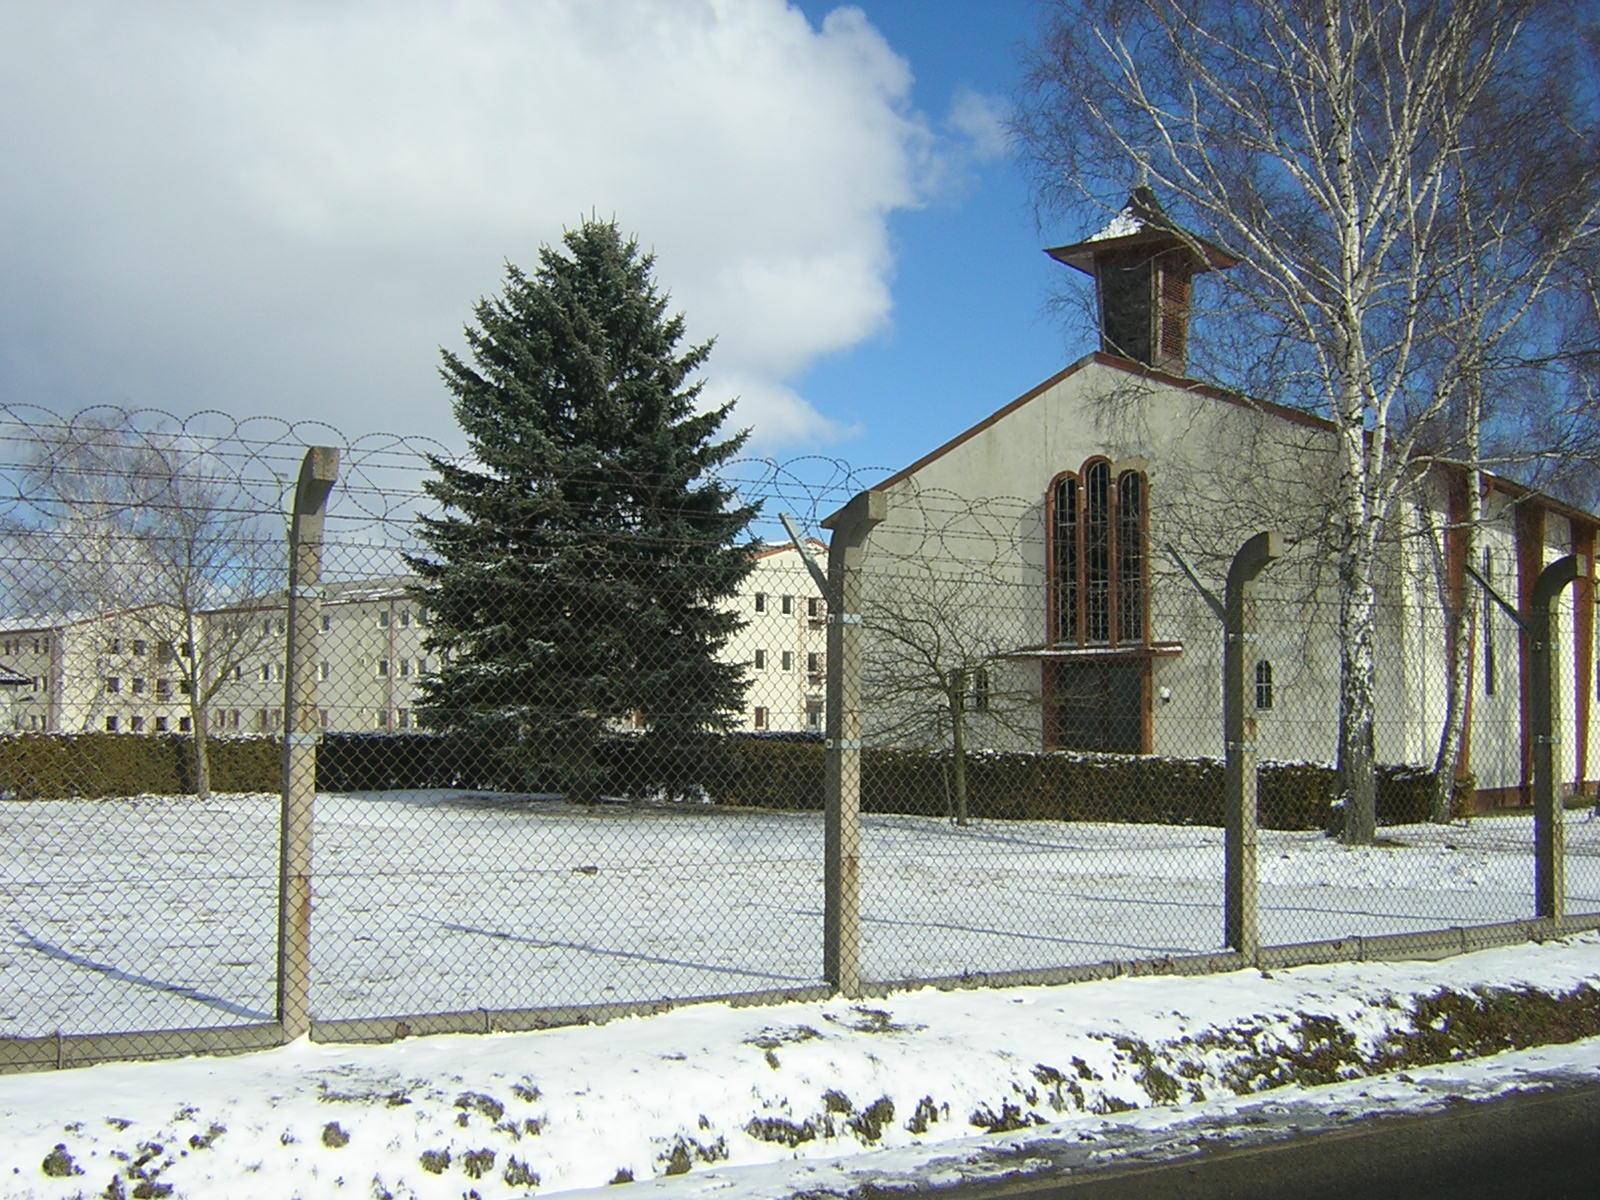 Kirchgoens Ayers Kaserne Chapel